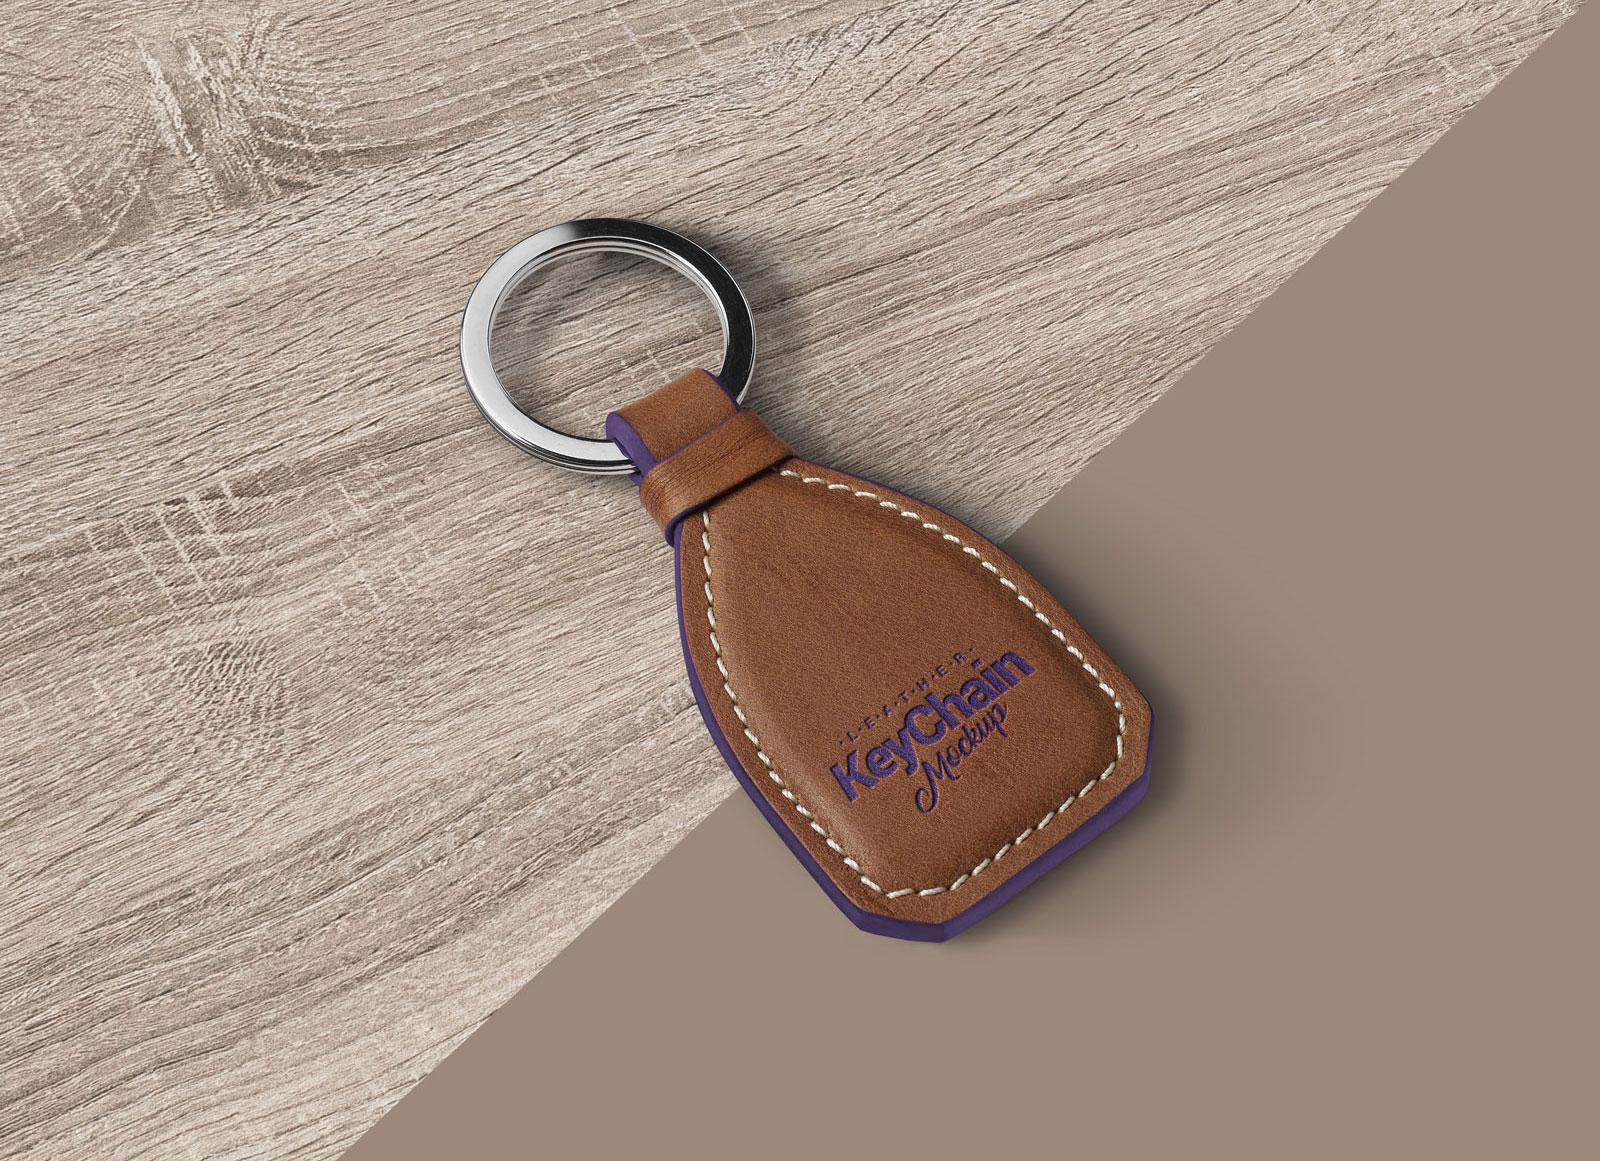 Free-Leather-Keychain-Mockup-PSD